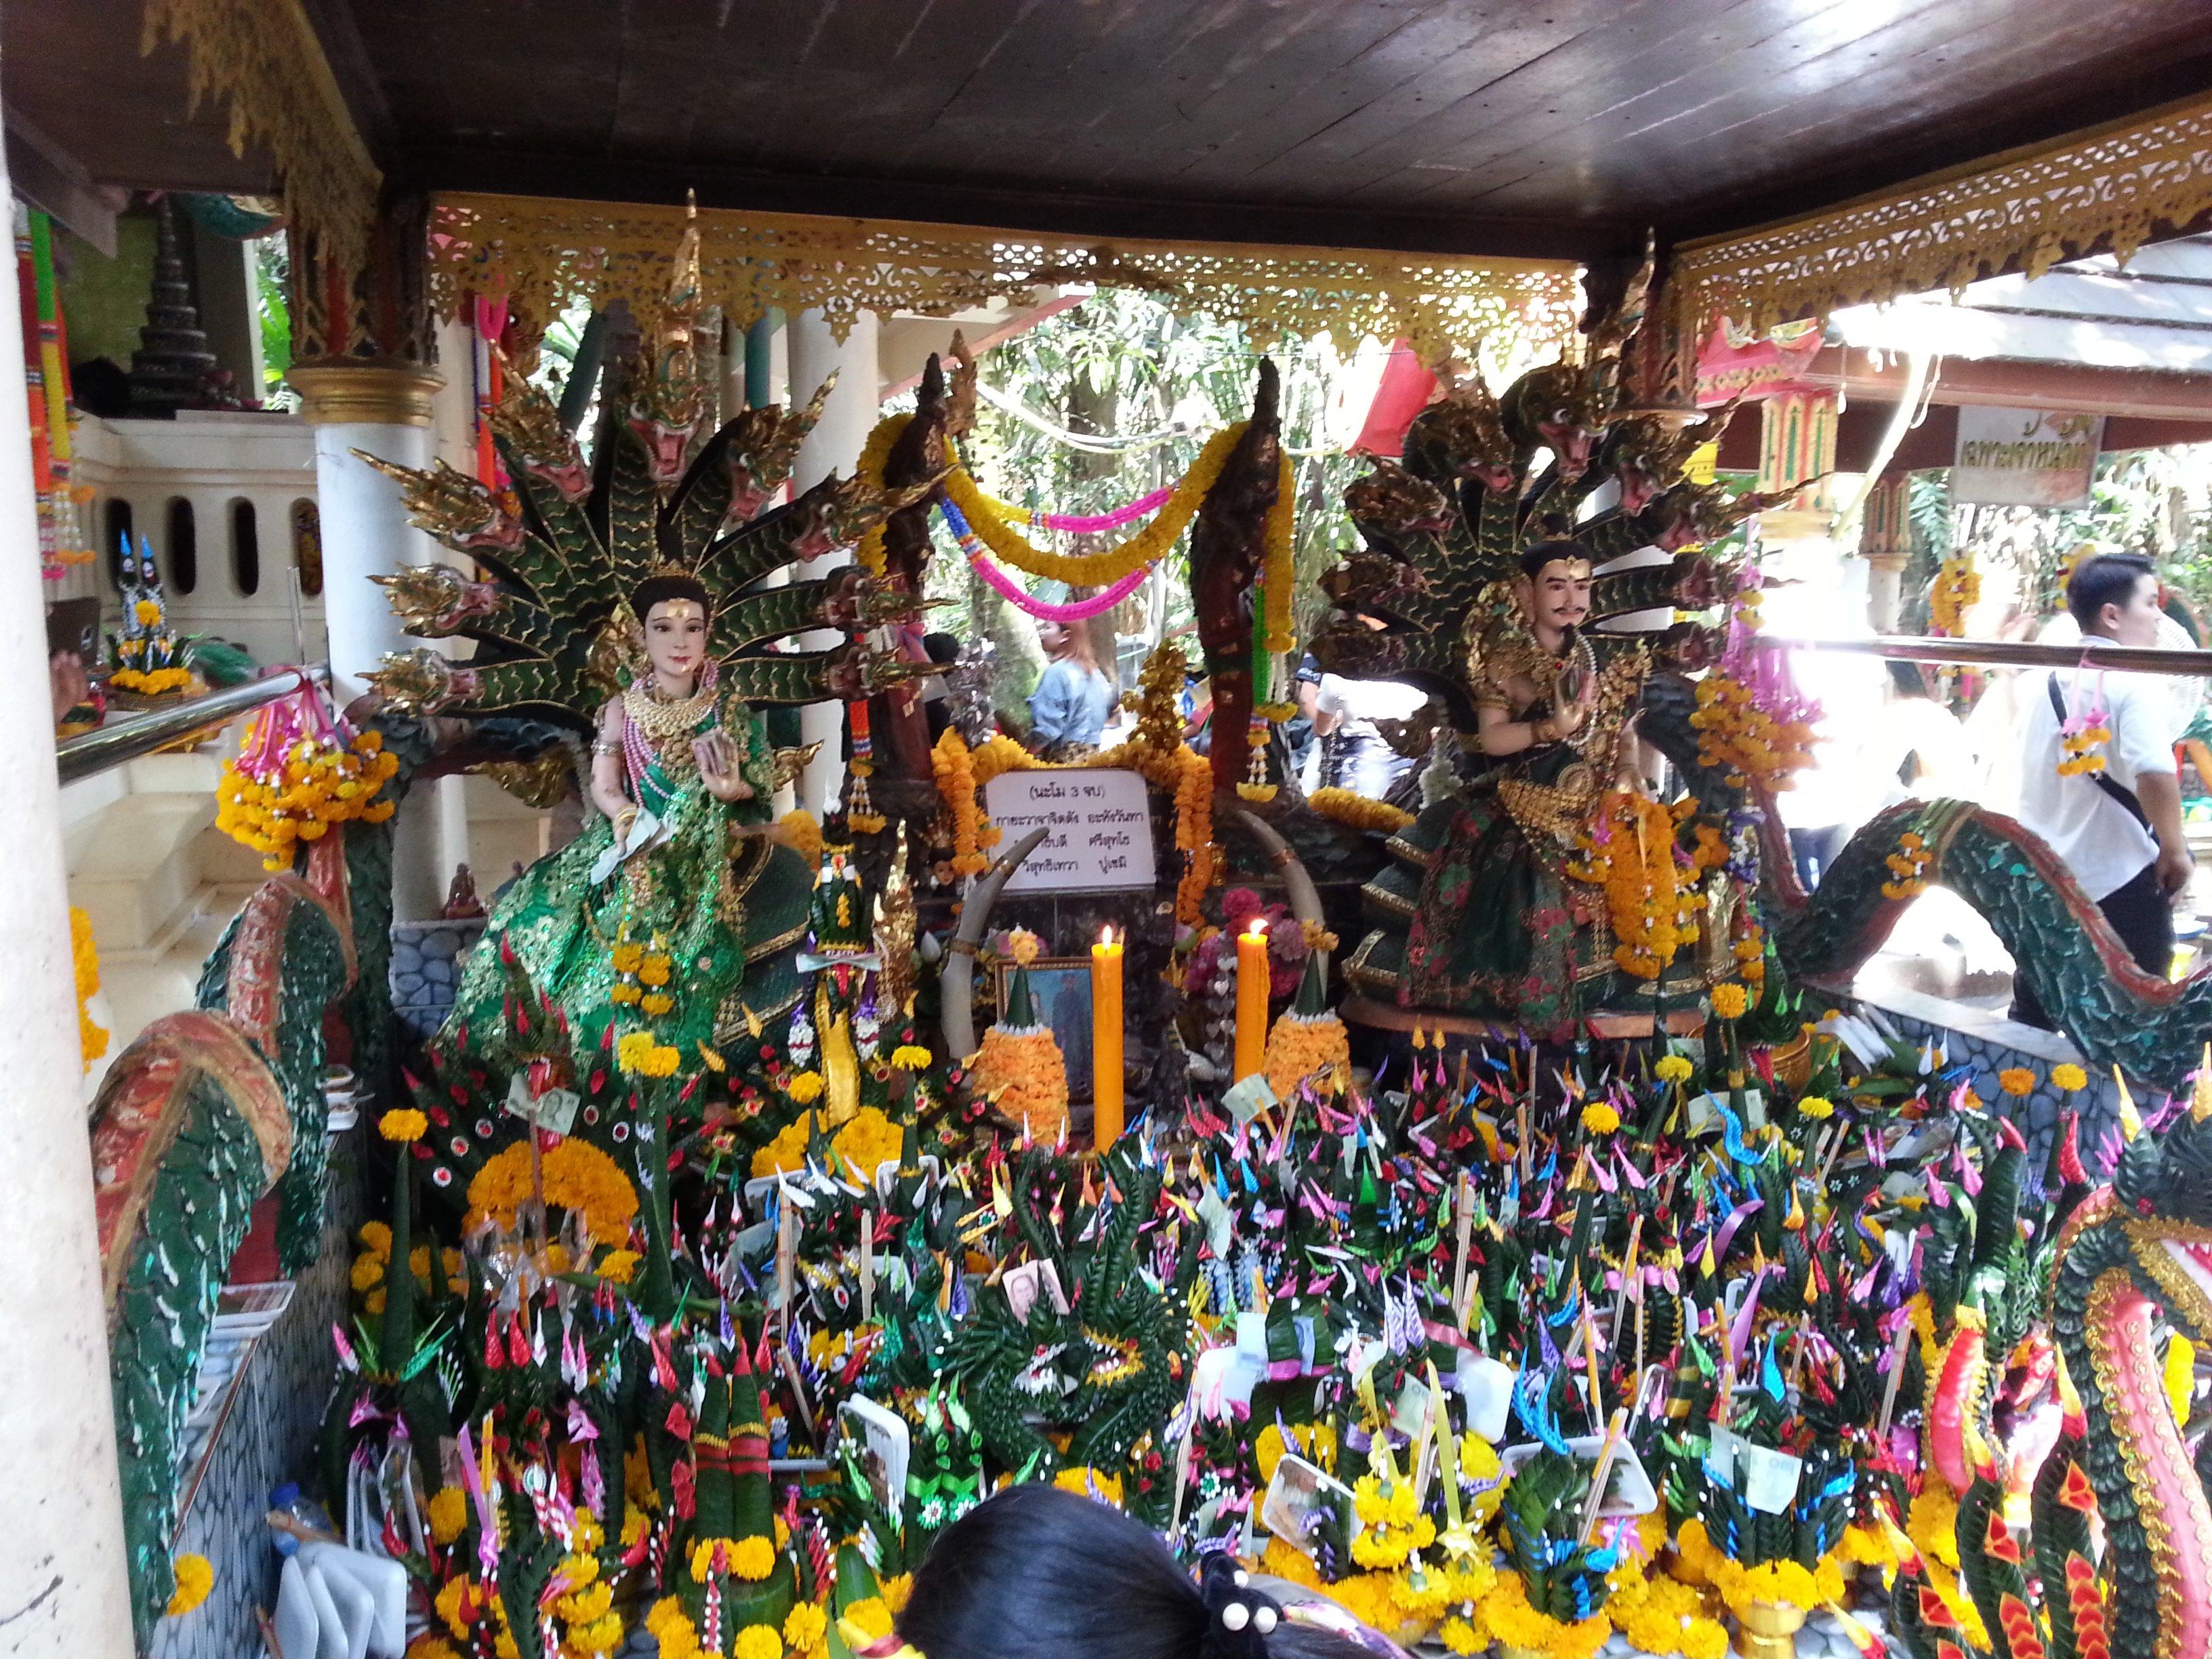 Shrine to Grandpa Naga Pu Si Suttho and Grandma Naga Si Pathumma